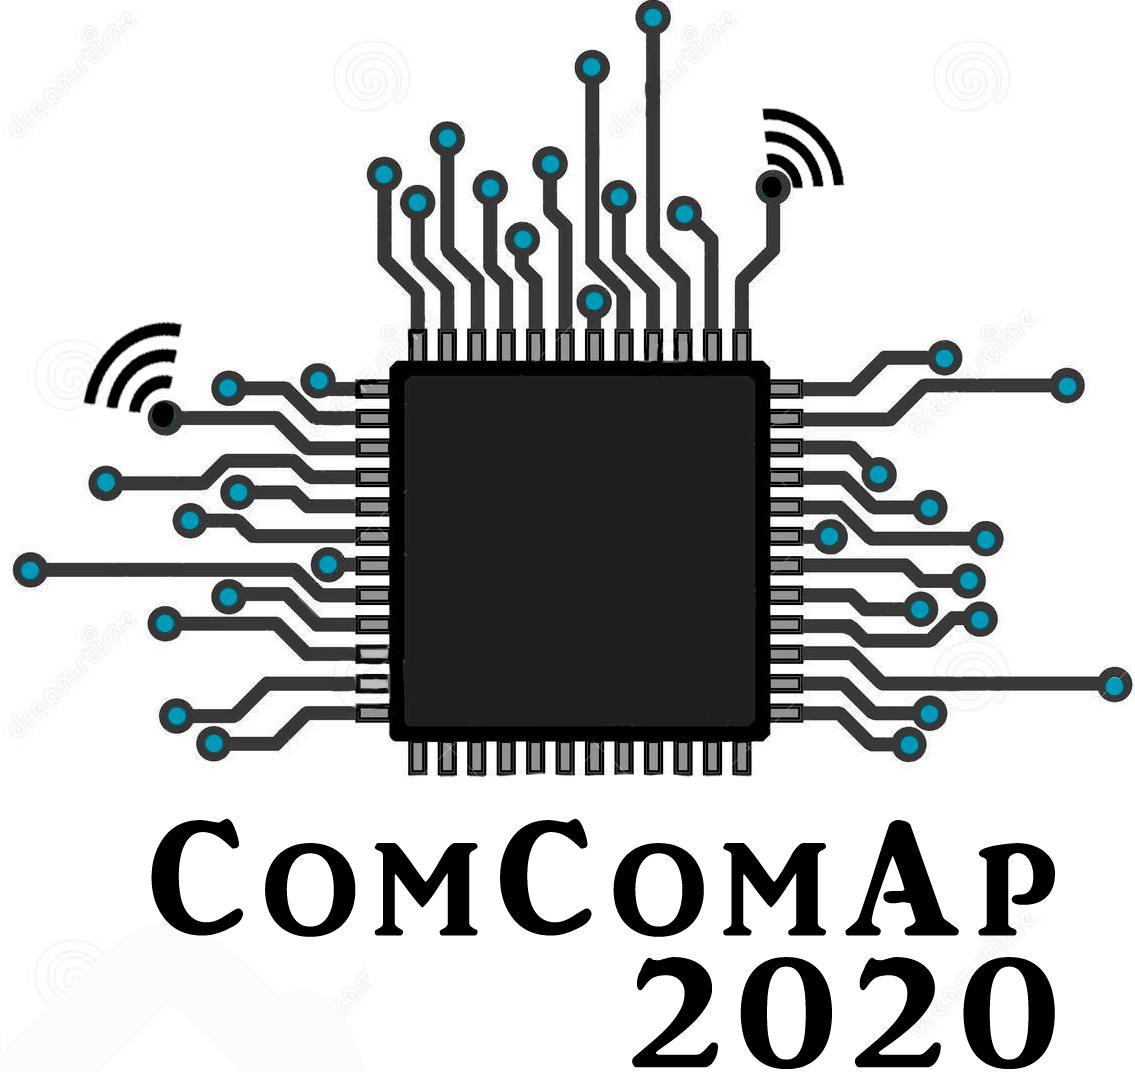 ComComAp 2020